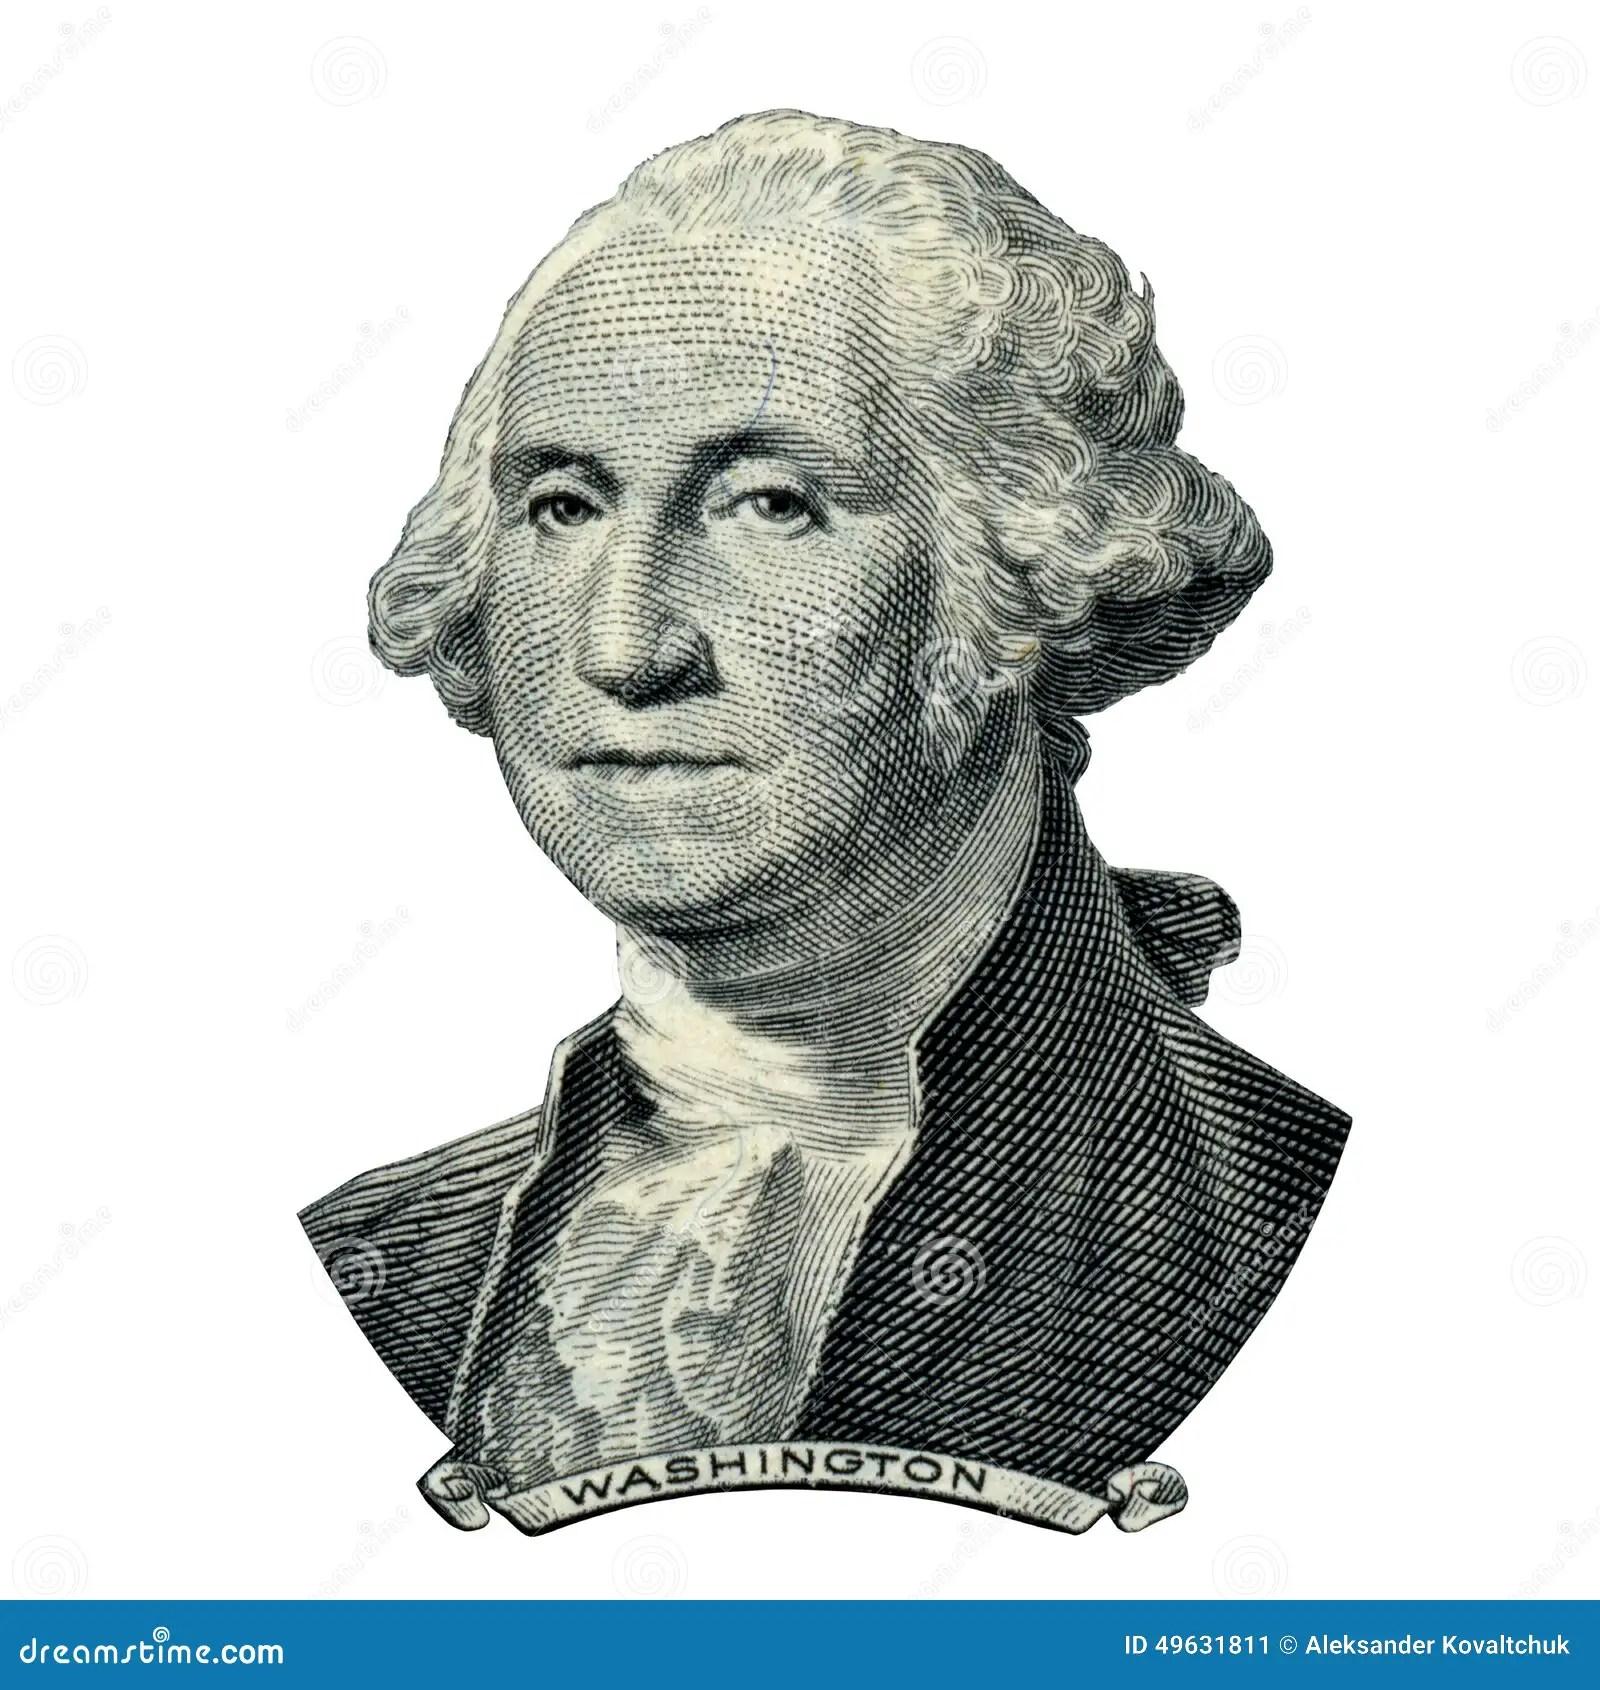 President Washington George Portrait Clipping Path Stock